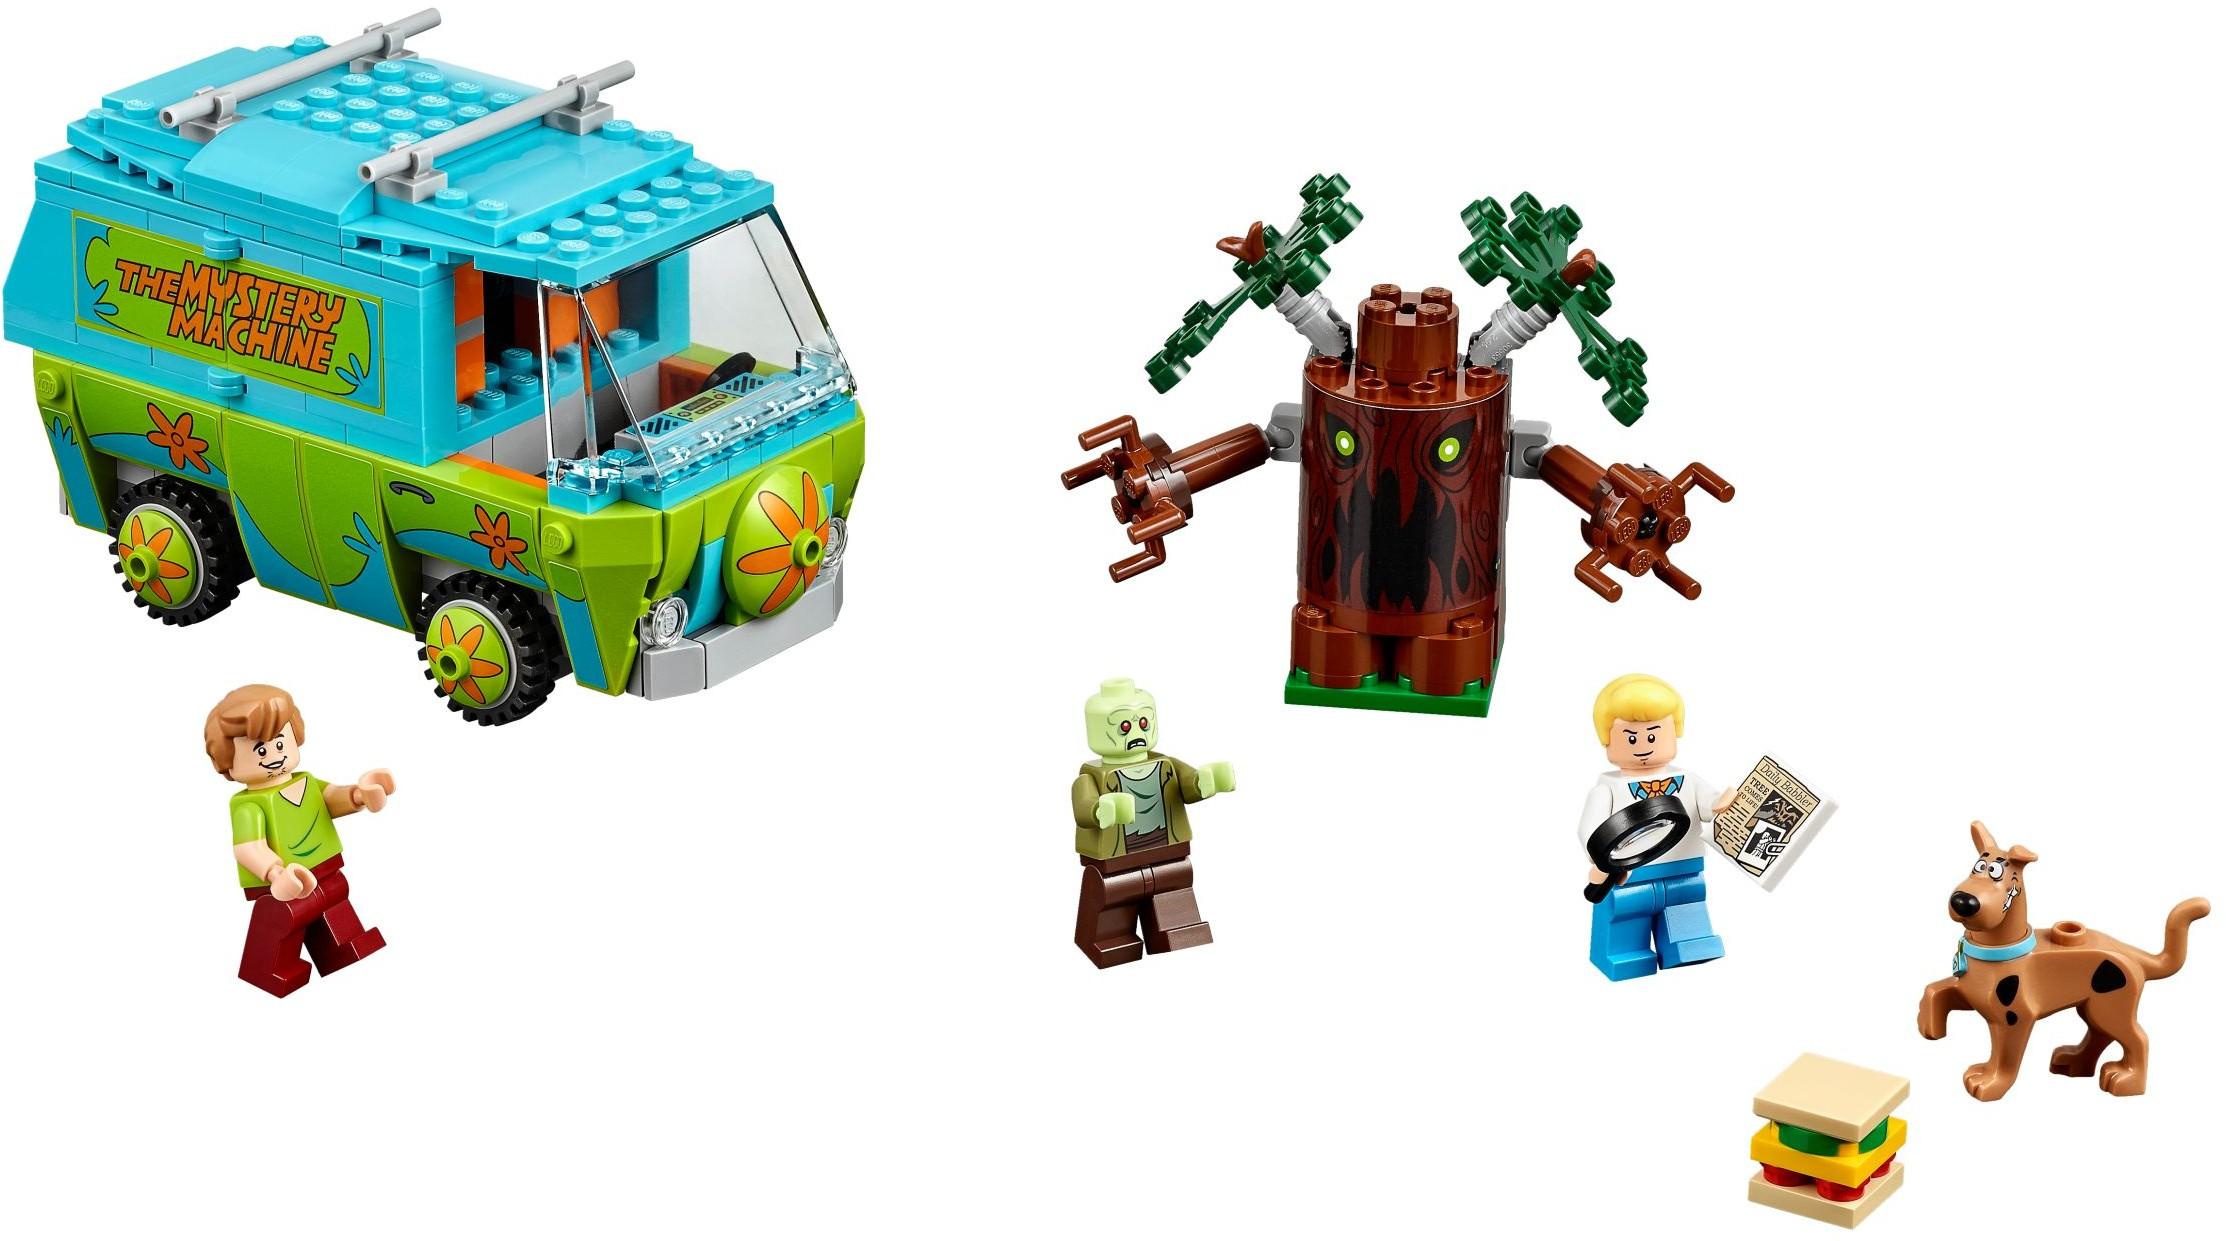 LEGO Scooby-Doo 75902 The Mystery Machine